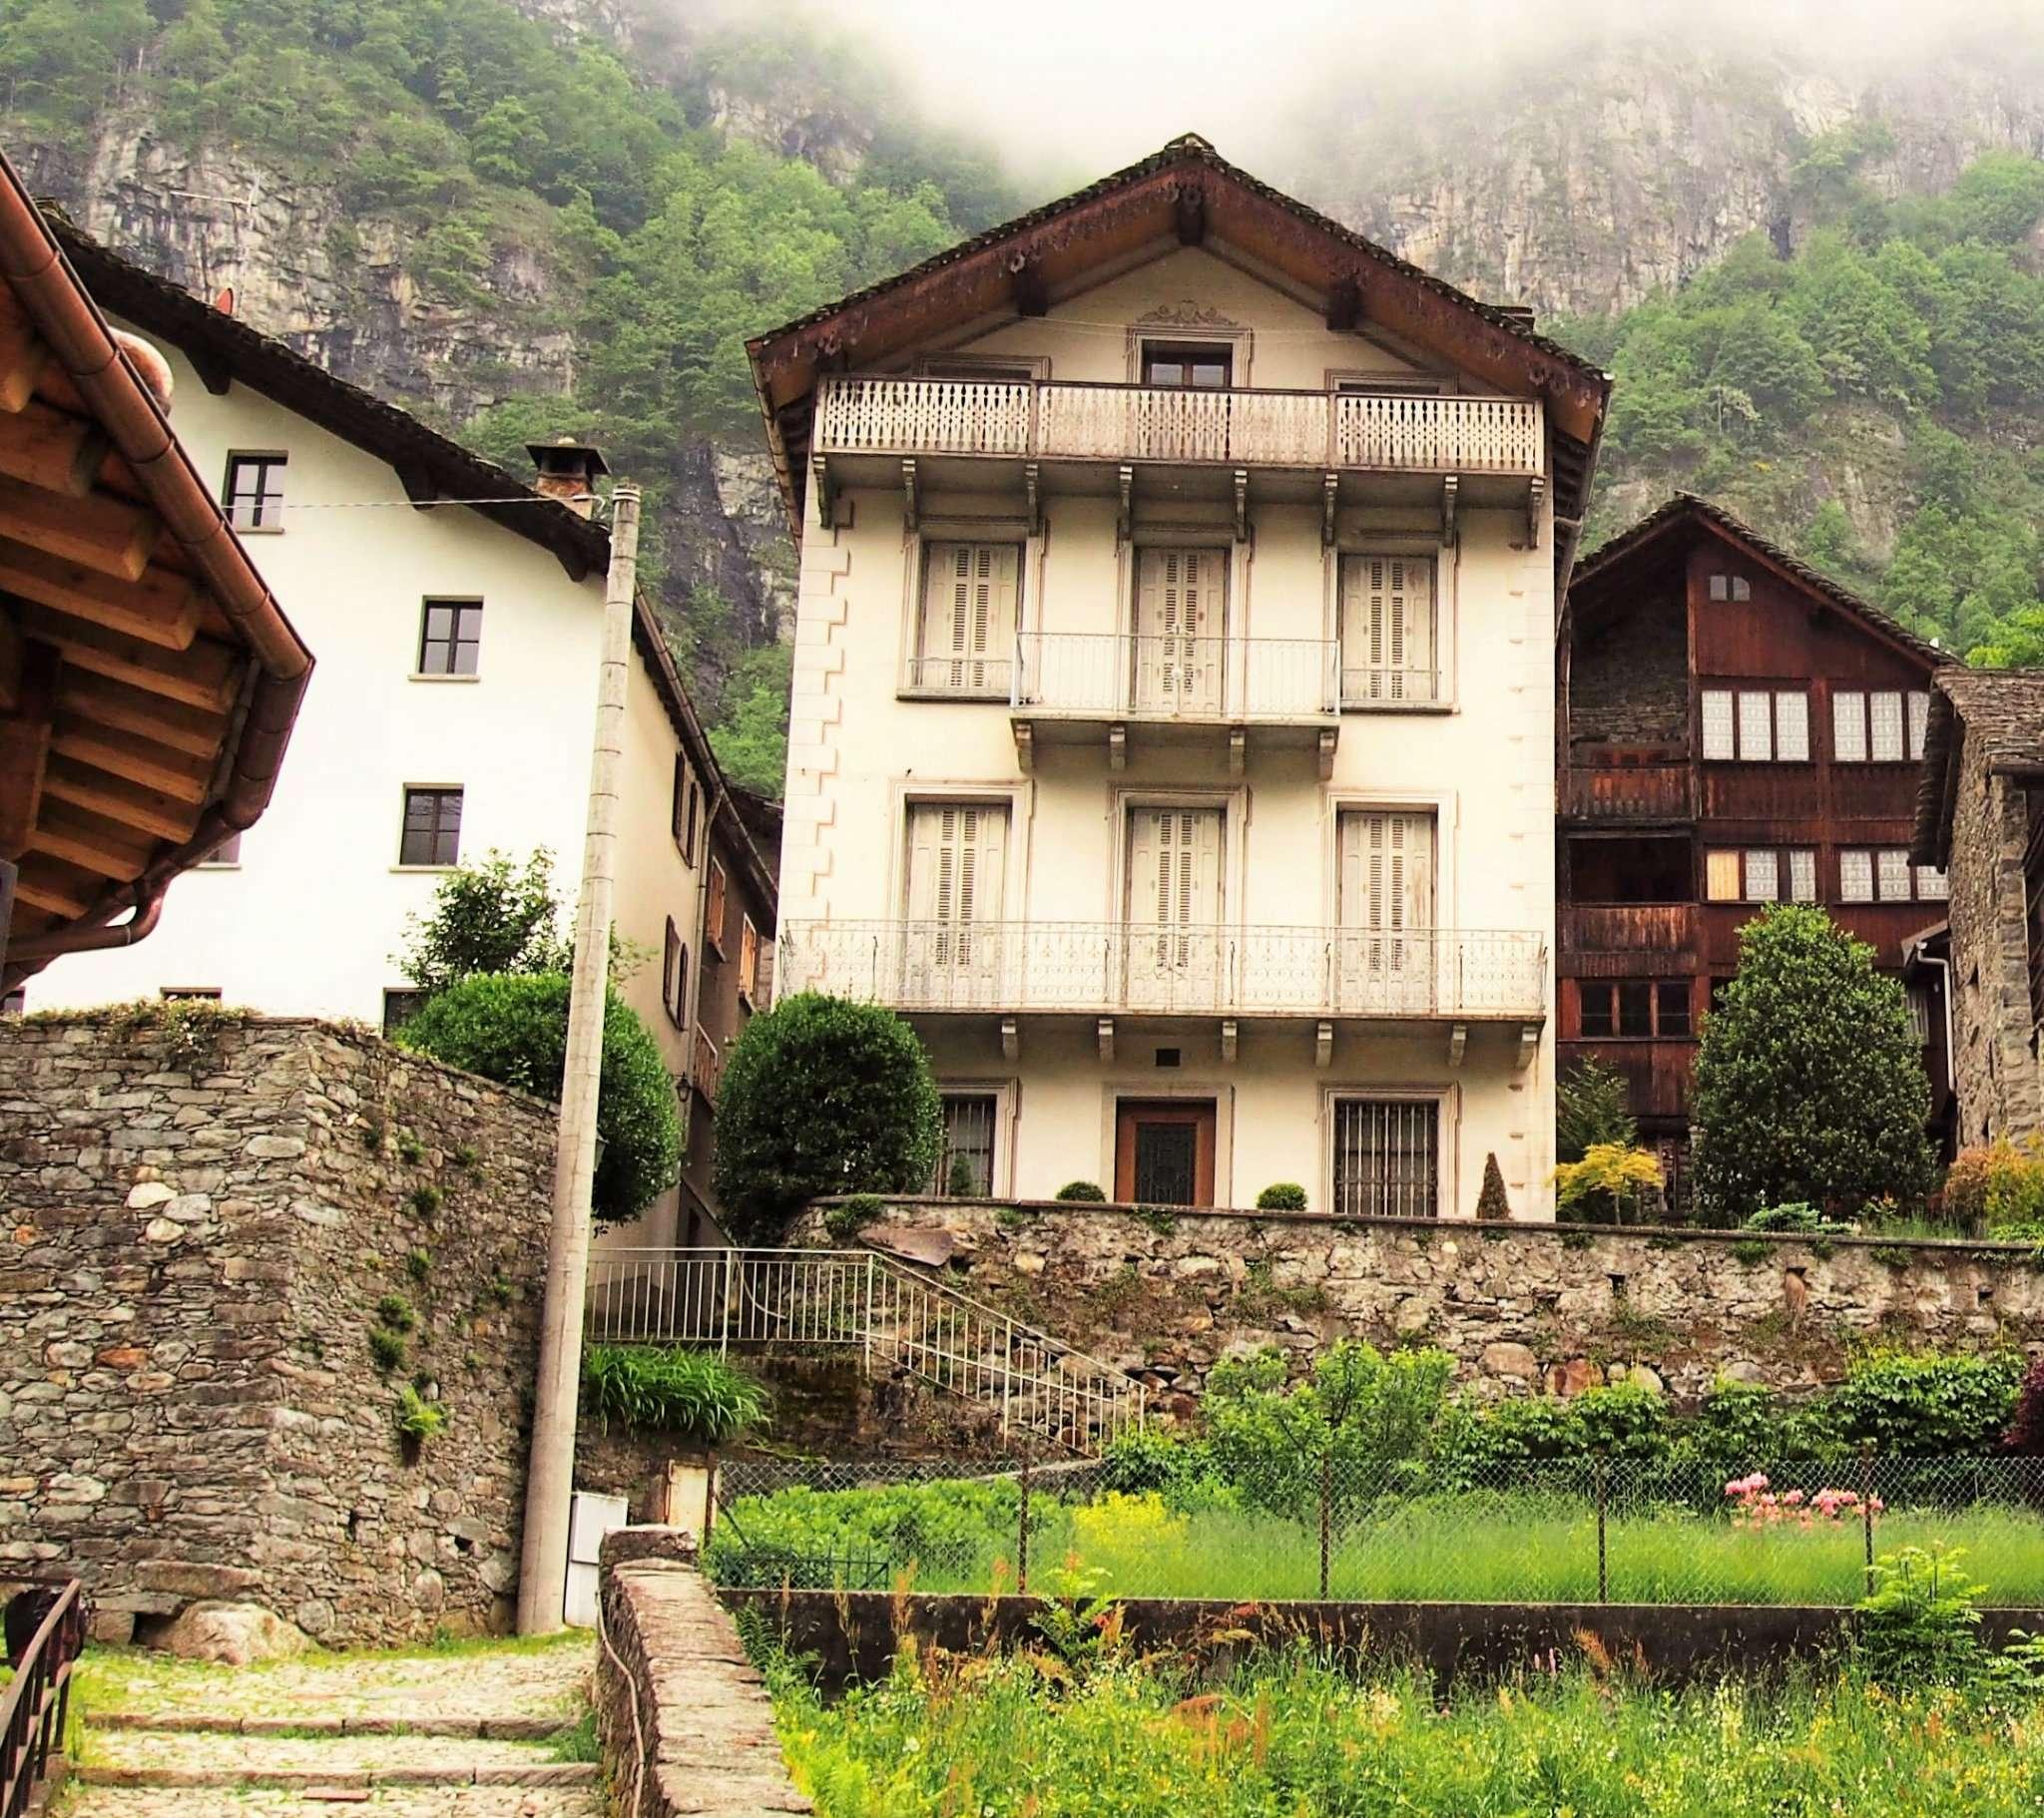 Bellissima casa d'epoca, indipendente, di 400 mq, a pochi km da Alagna Vaisesia.